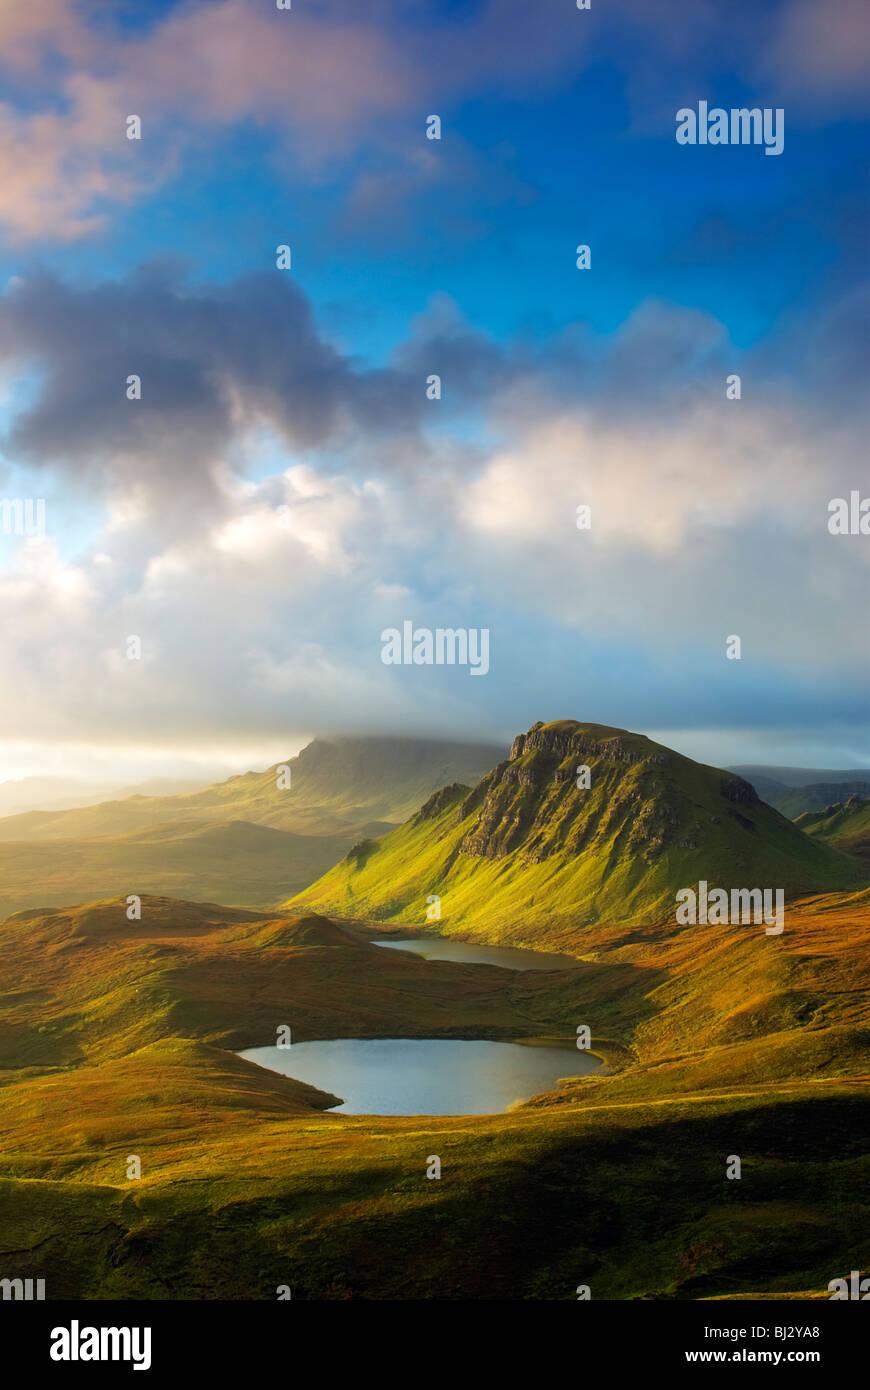 View of the Trotternish Ridge at sunrise, Quirang, Isle of Skye - Stock Image